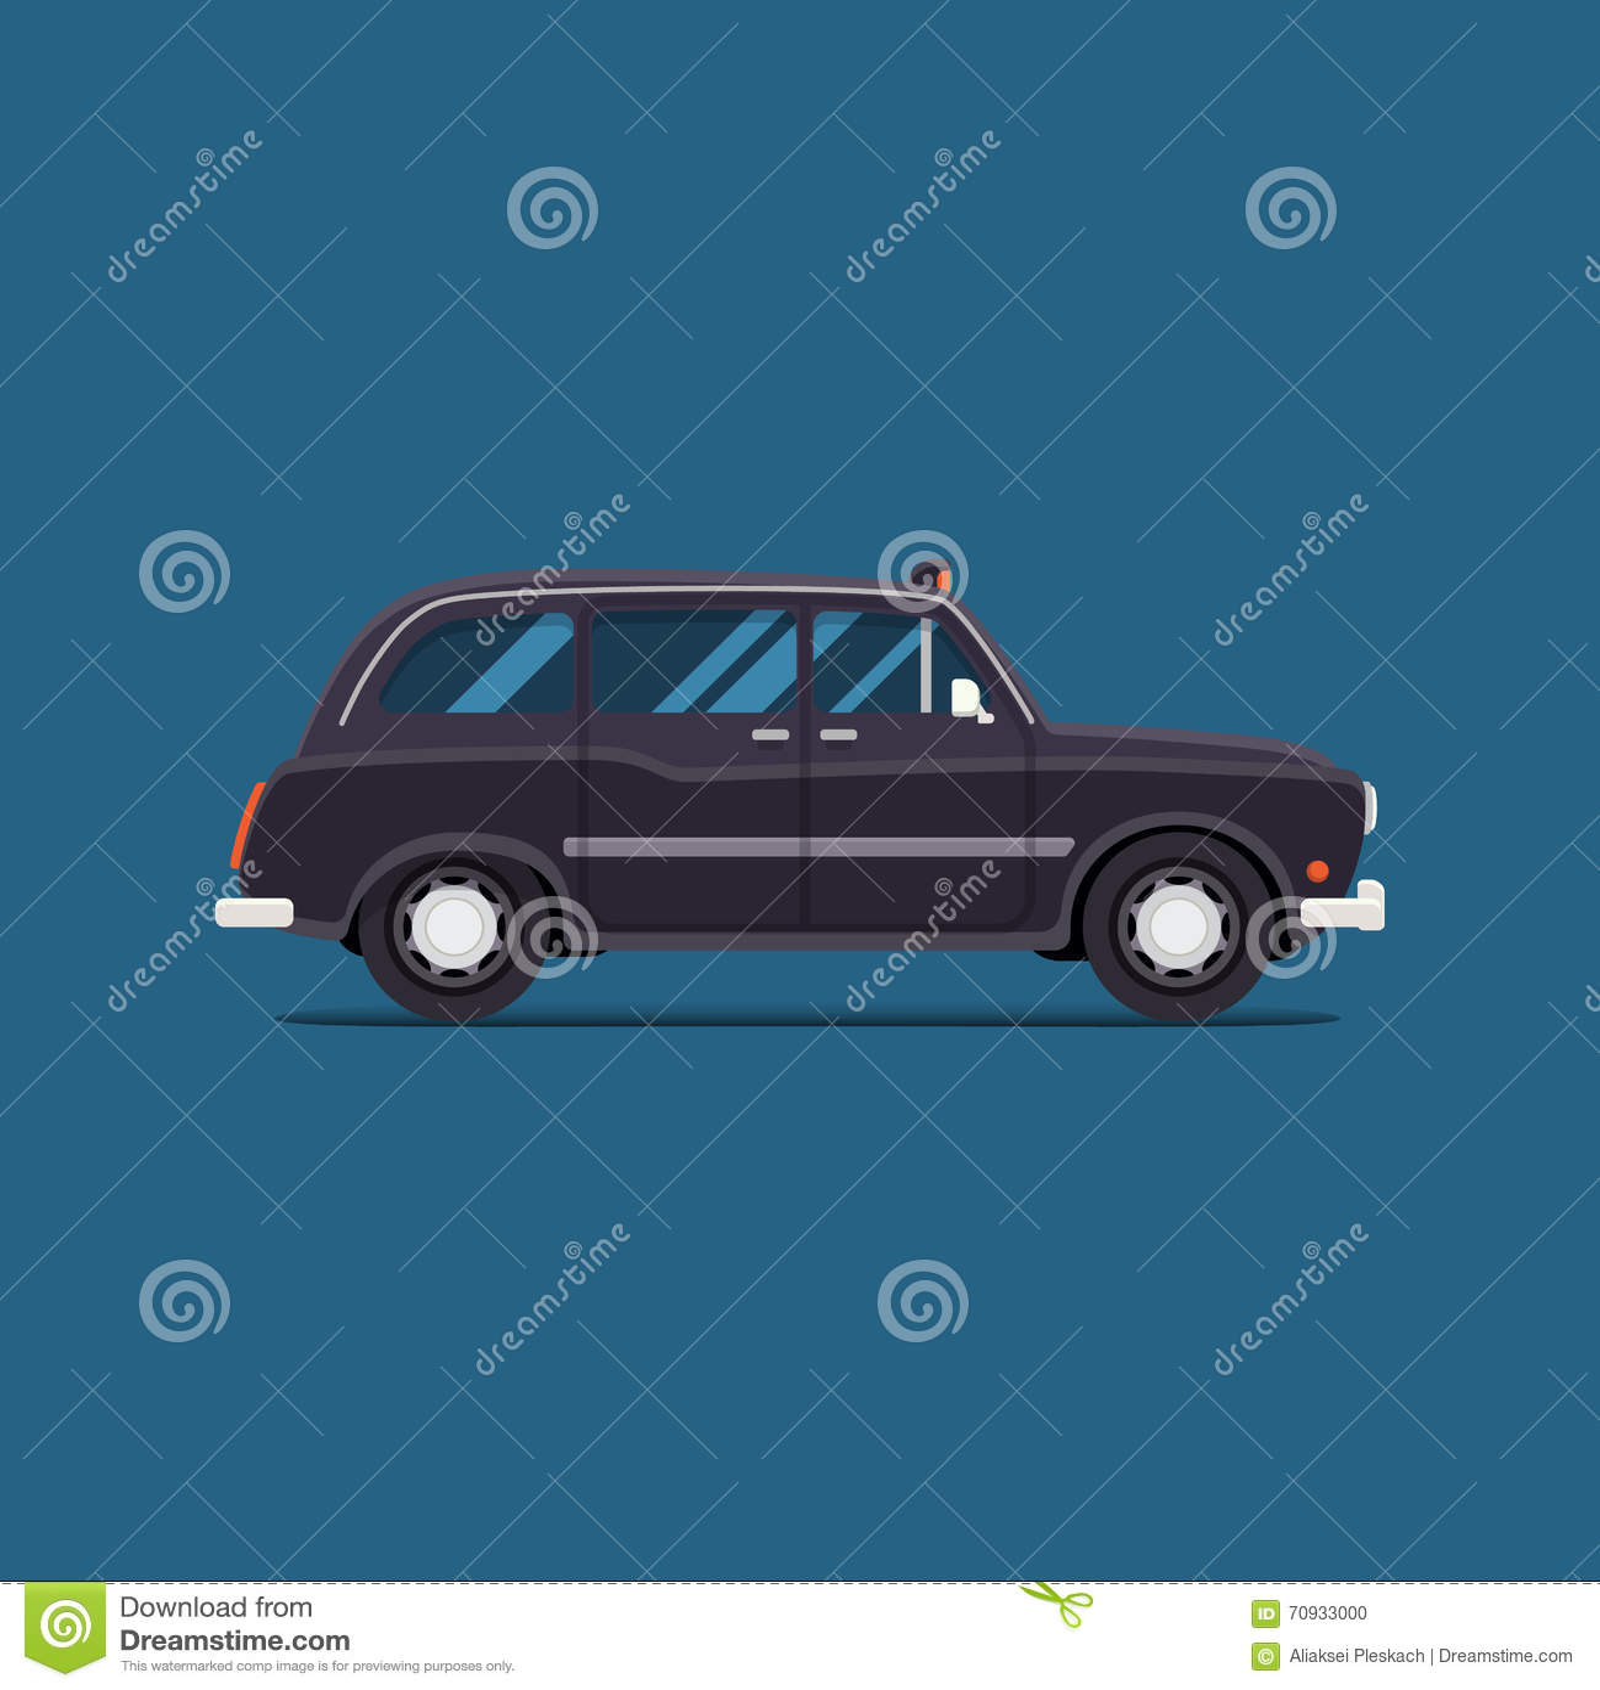 Black elements in taxi driver essay